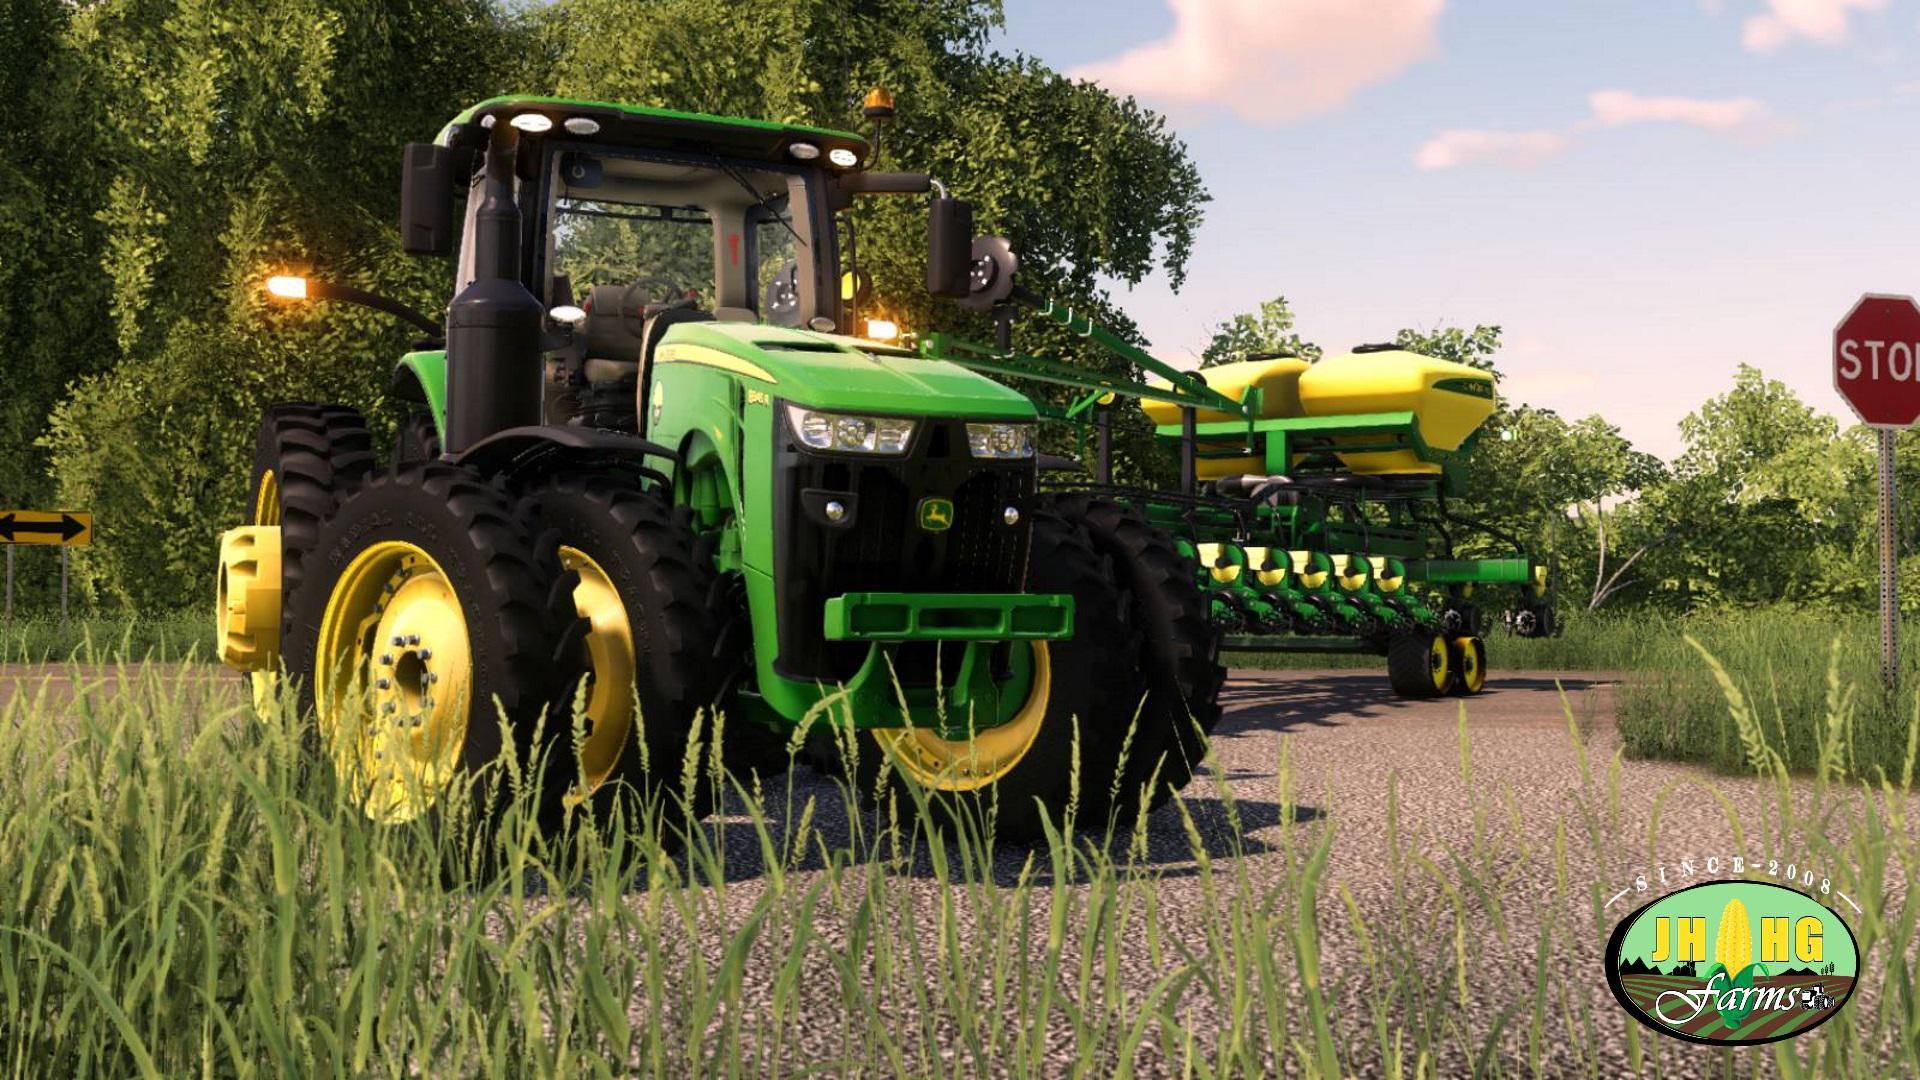 John Deere 8R US Series 2018 v 3 1 | FS19 mods, Farming simulator 19